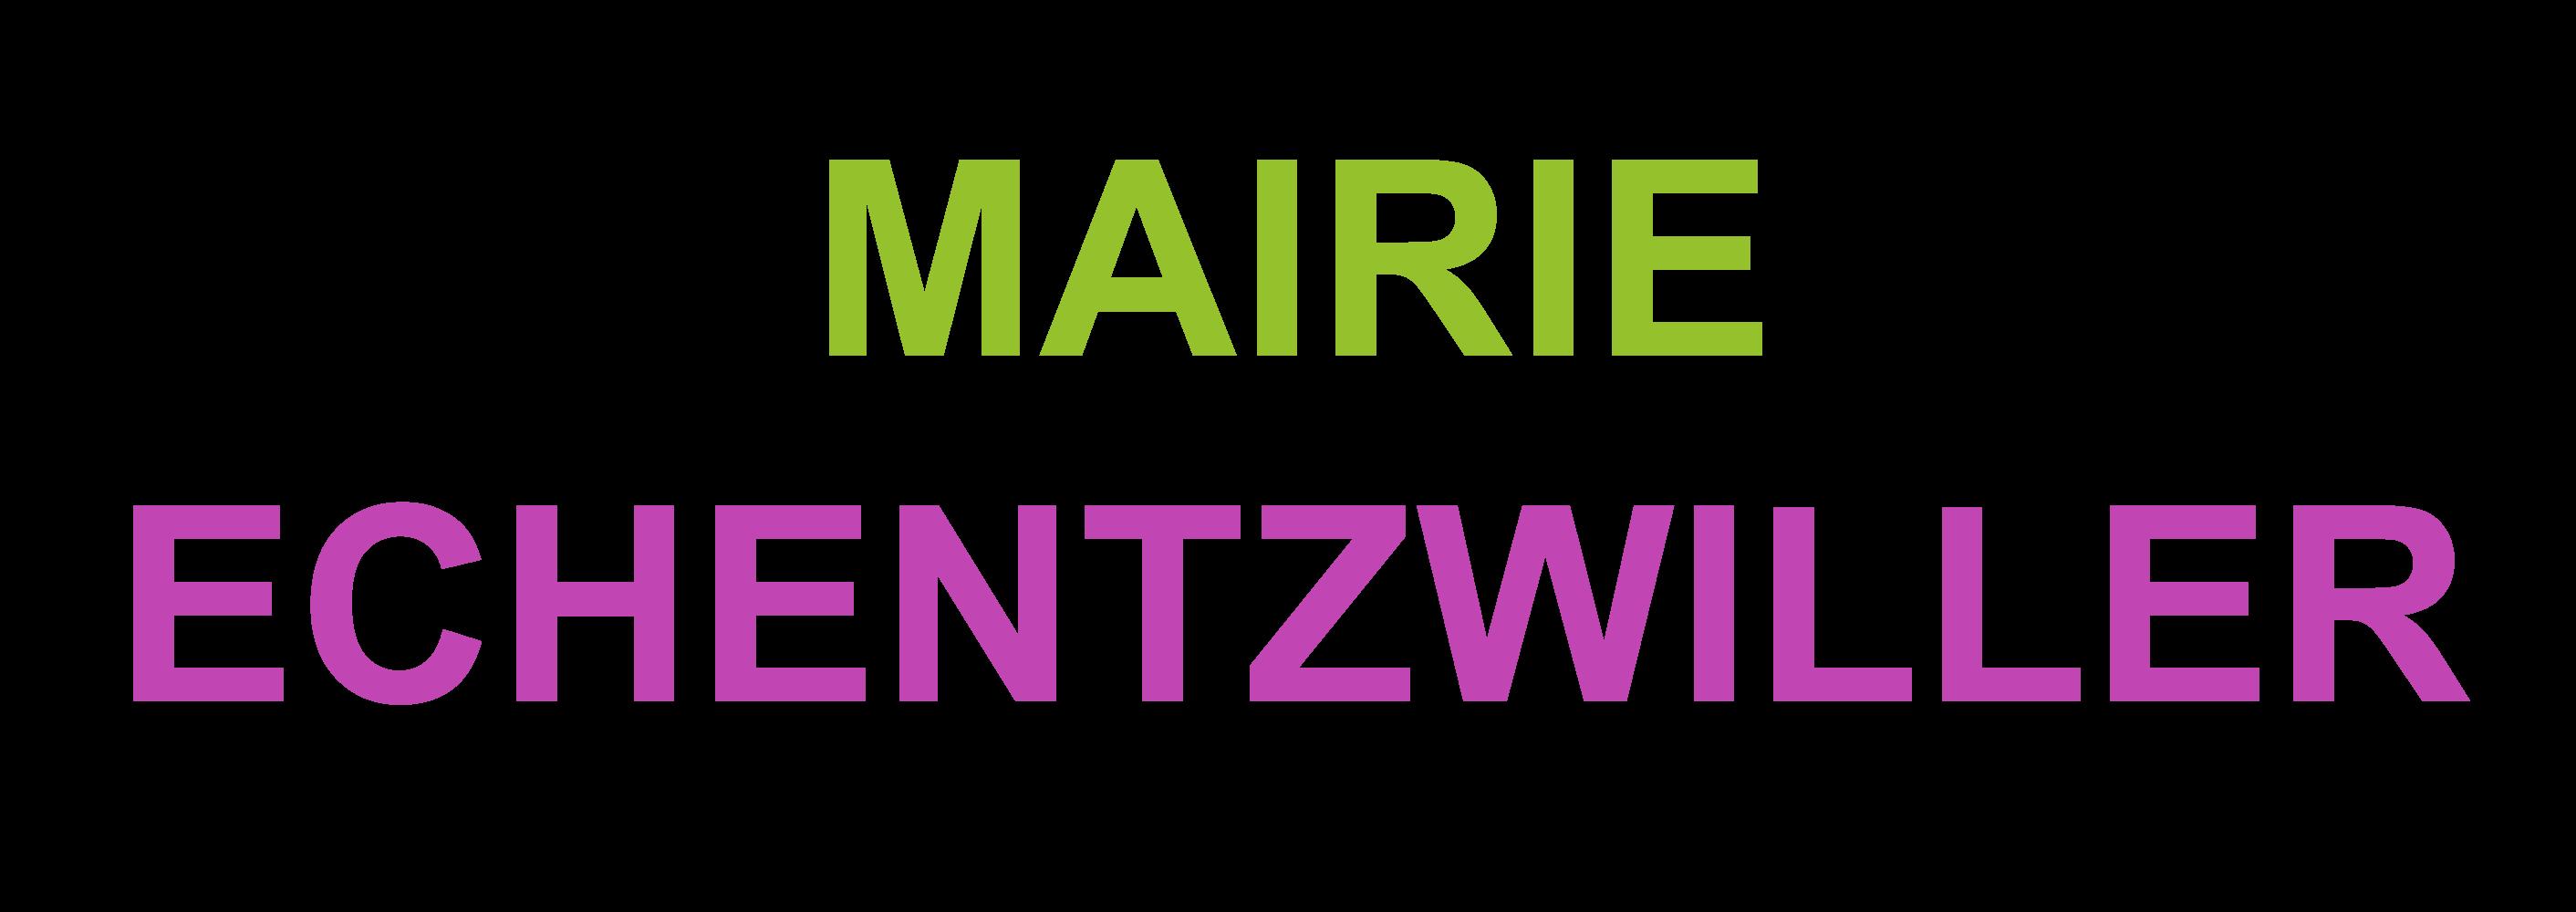 agence web alsace mulhouse site internet mairie